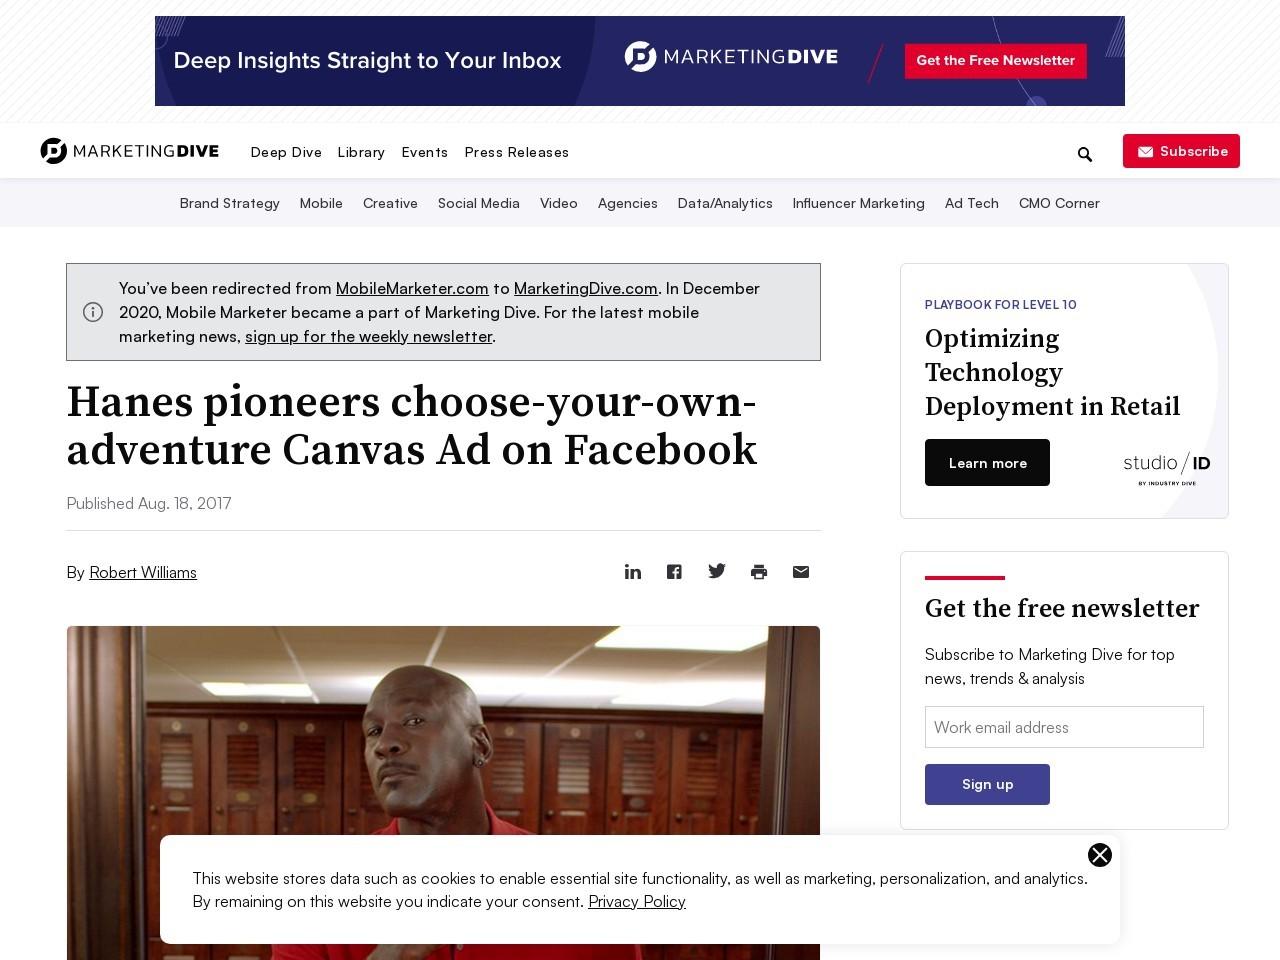 Hanes pioneers choose-your-own-adventure Canvas Ad on Facebook